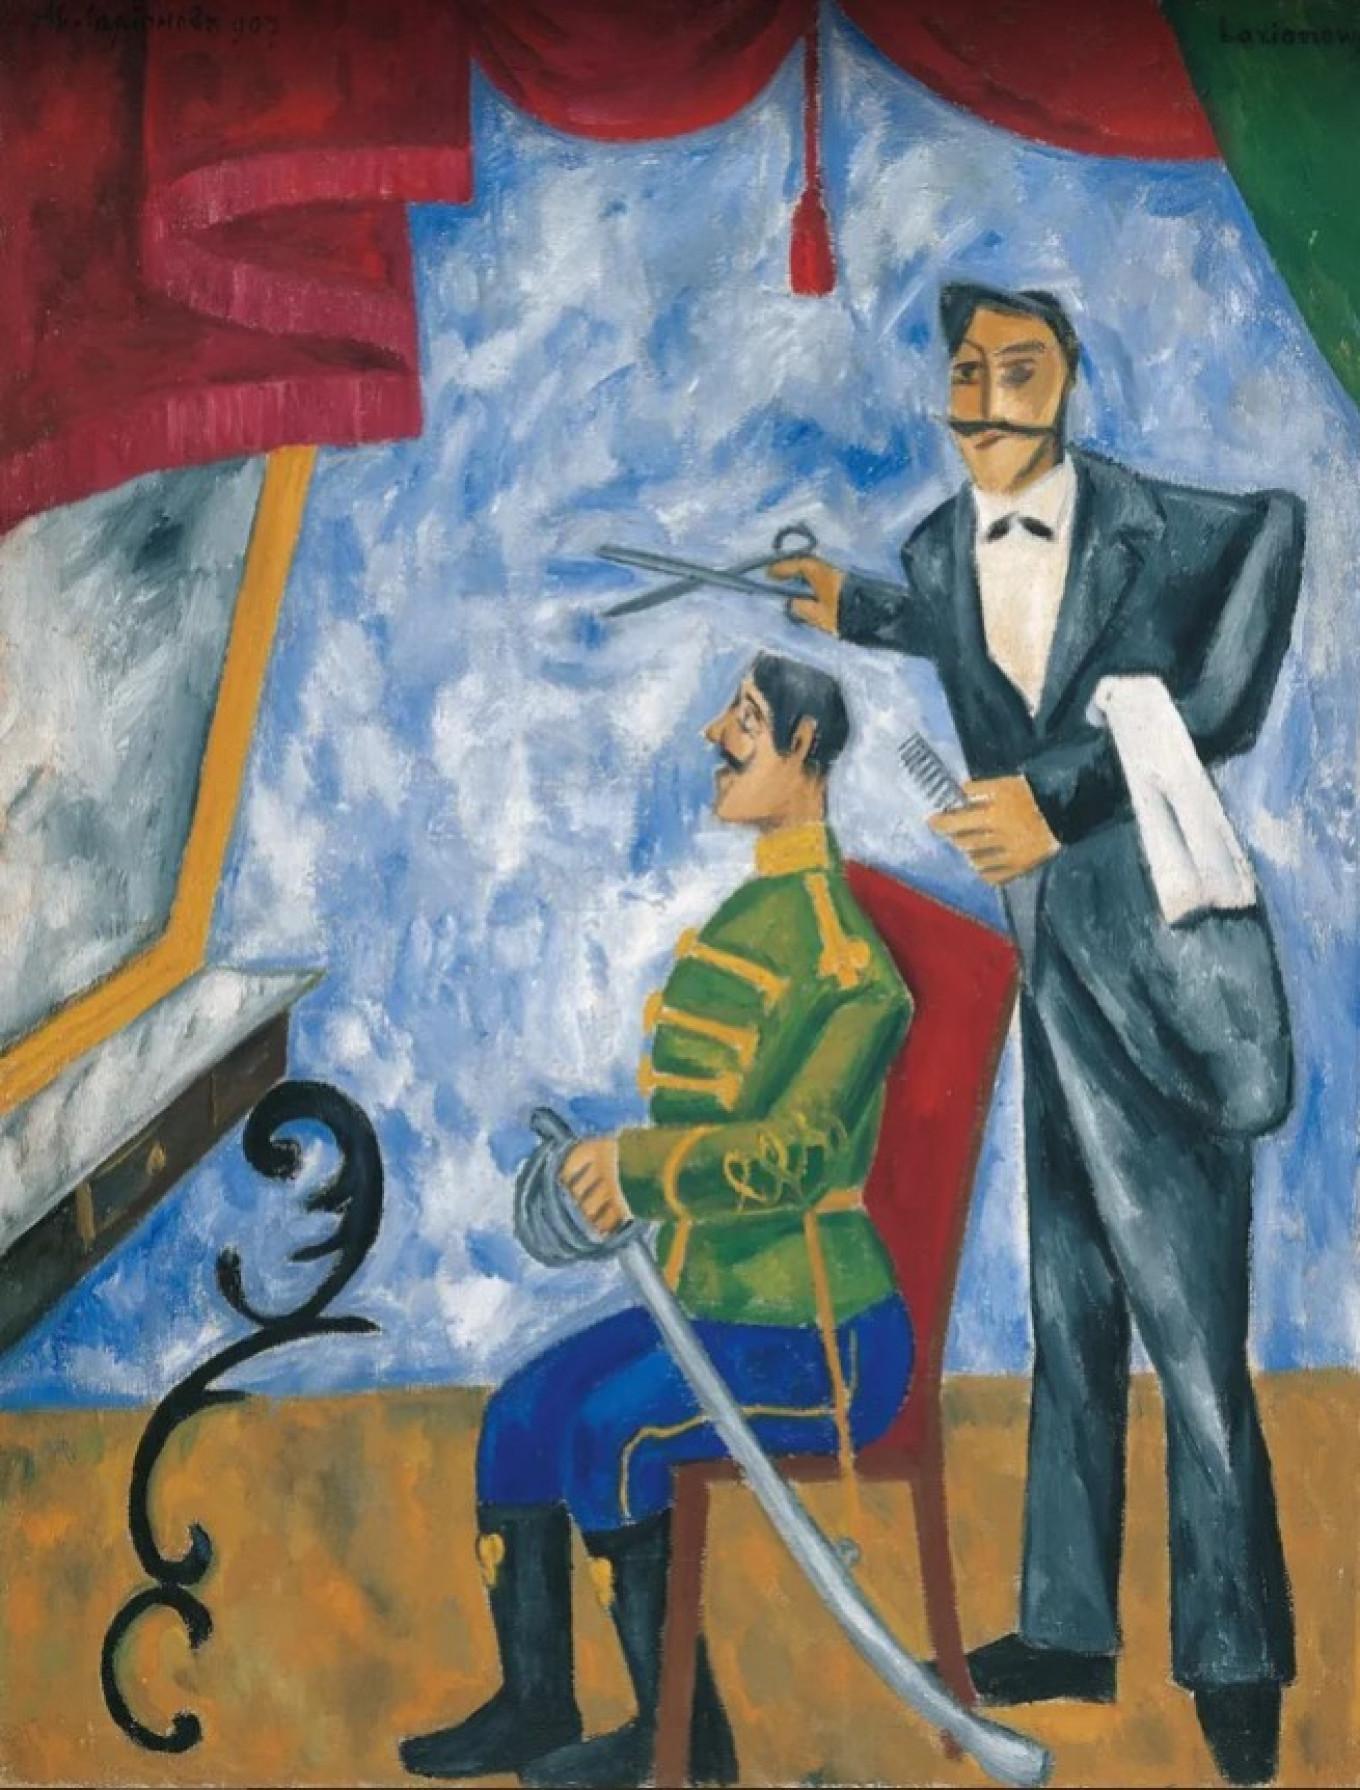 """Officer's Barber,"" by Mikhail Larionov, 1907-1909 Albertina Gallery, Vienna"